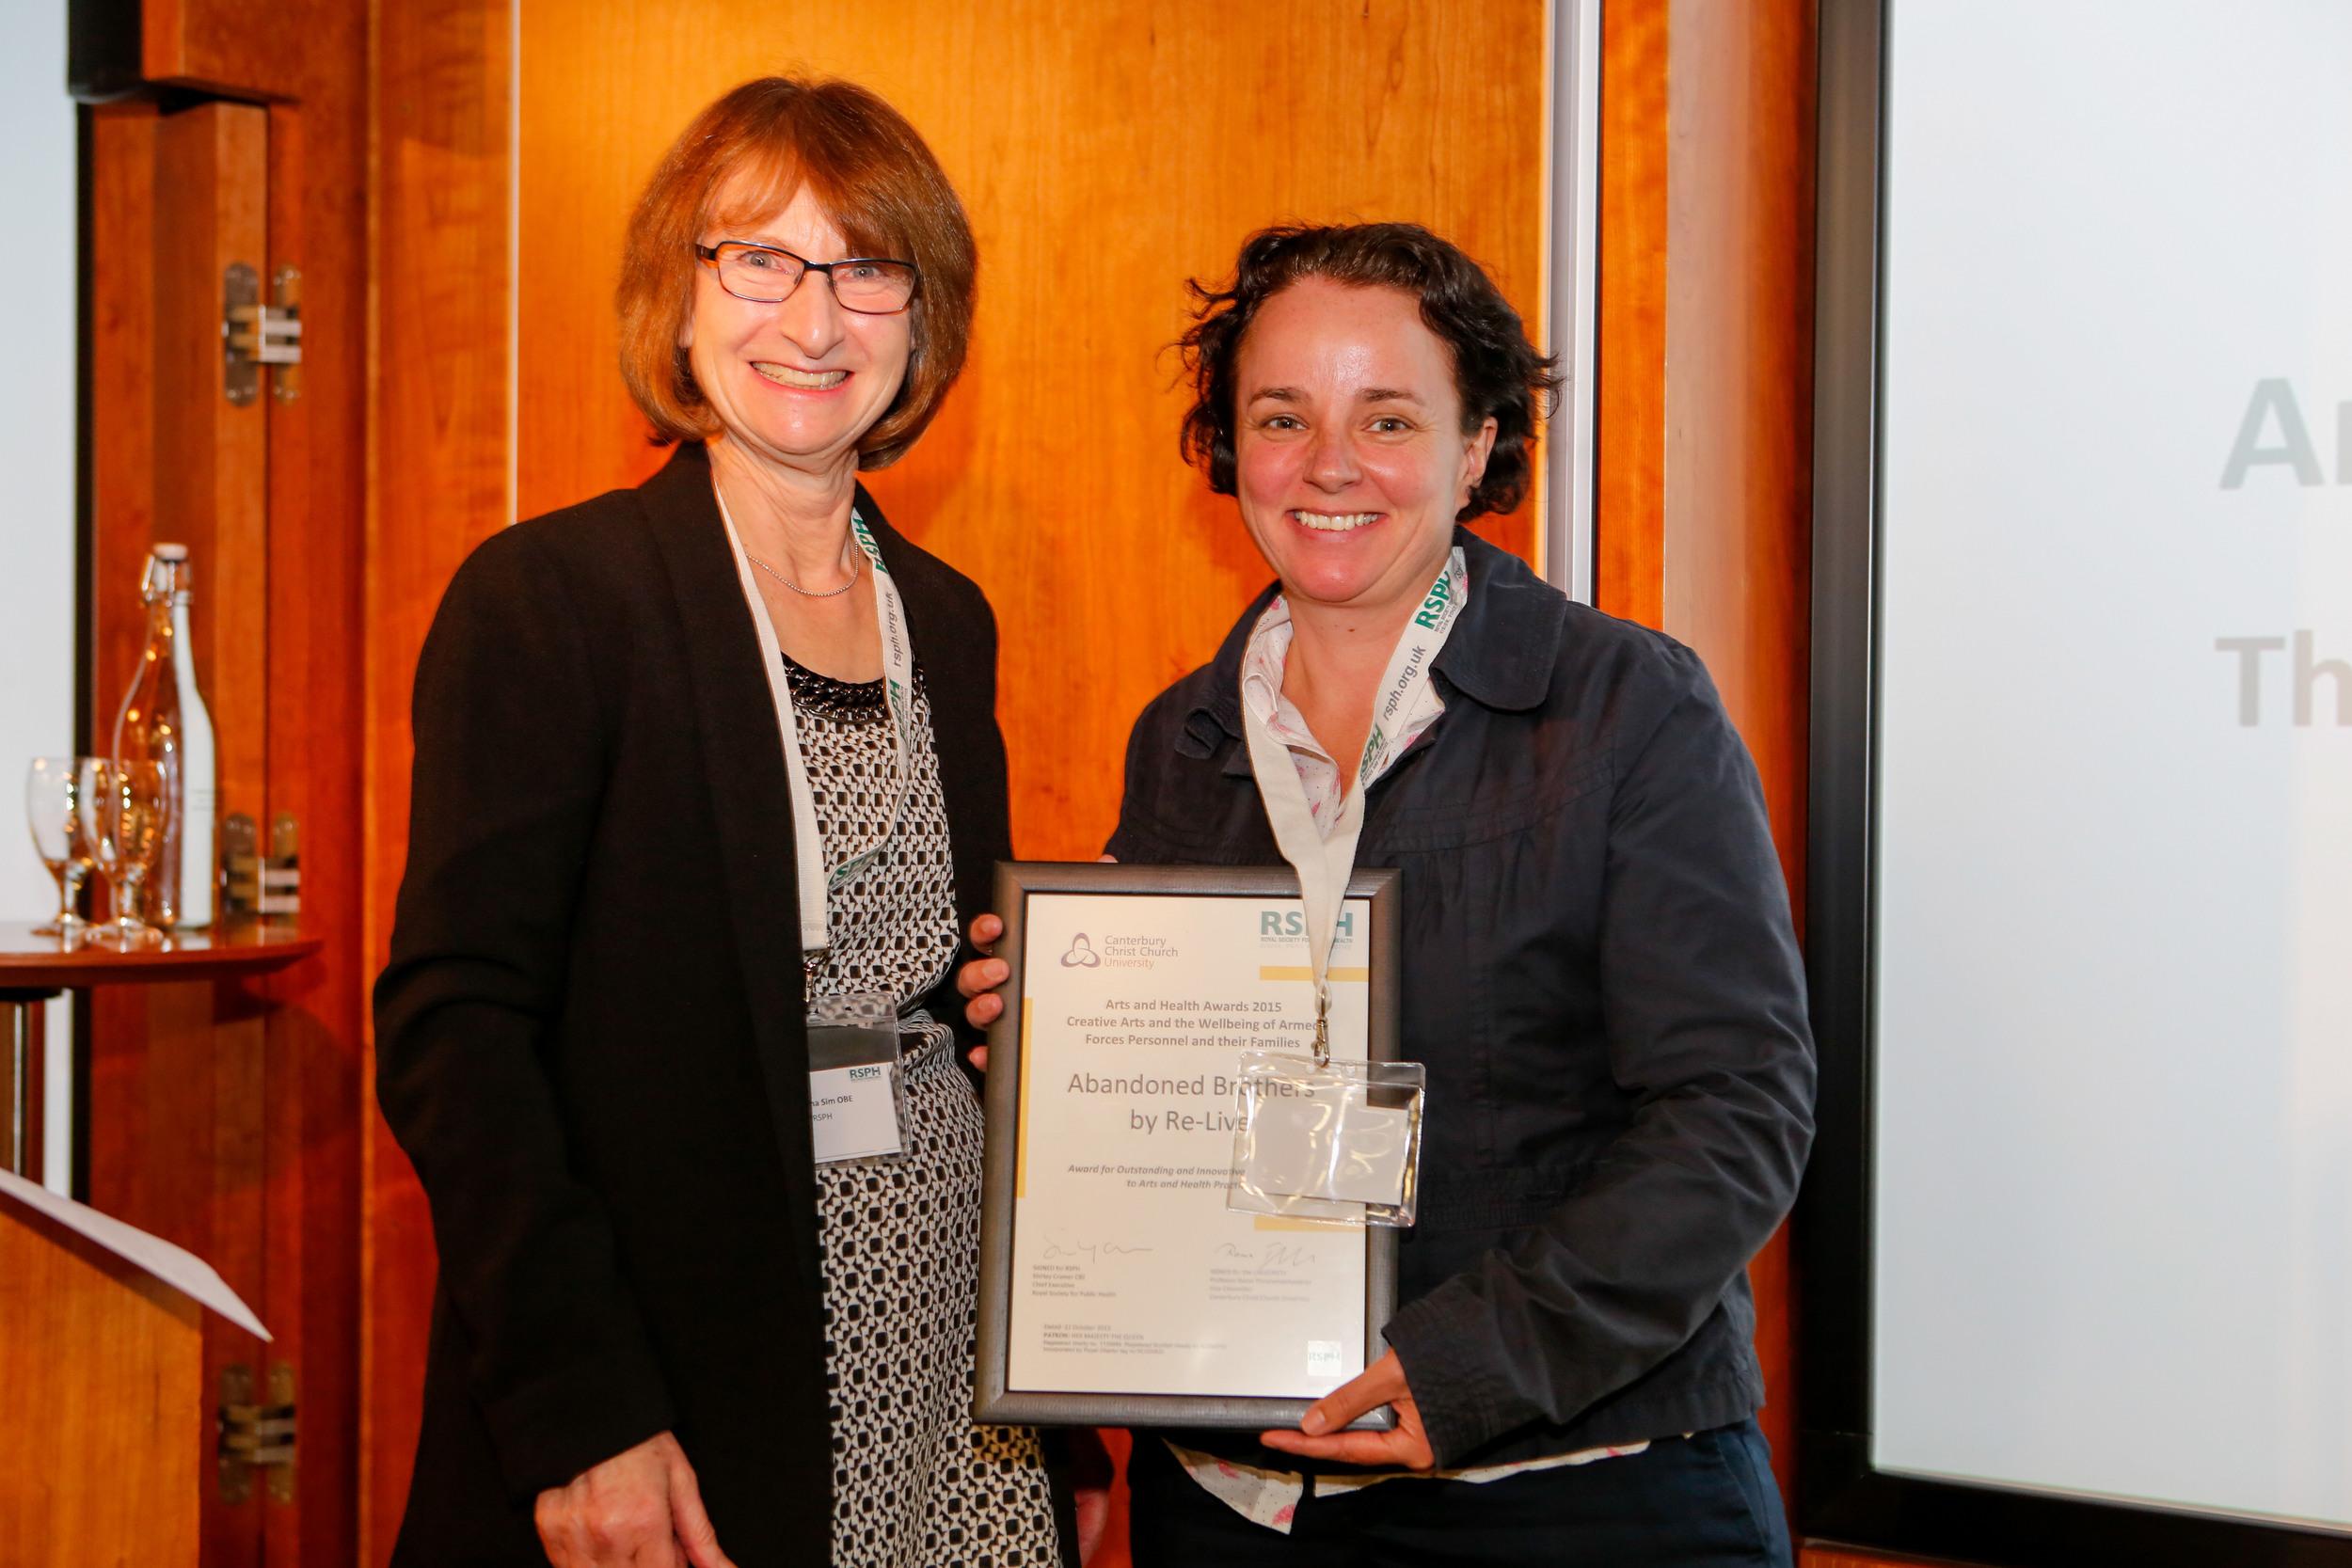 Sarah Belson receiving award on behalf of Re-Live